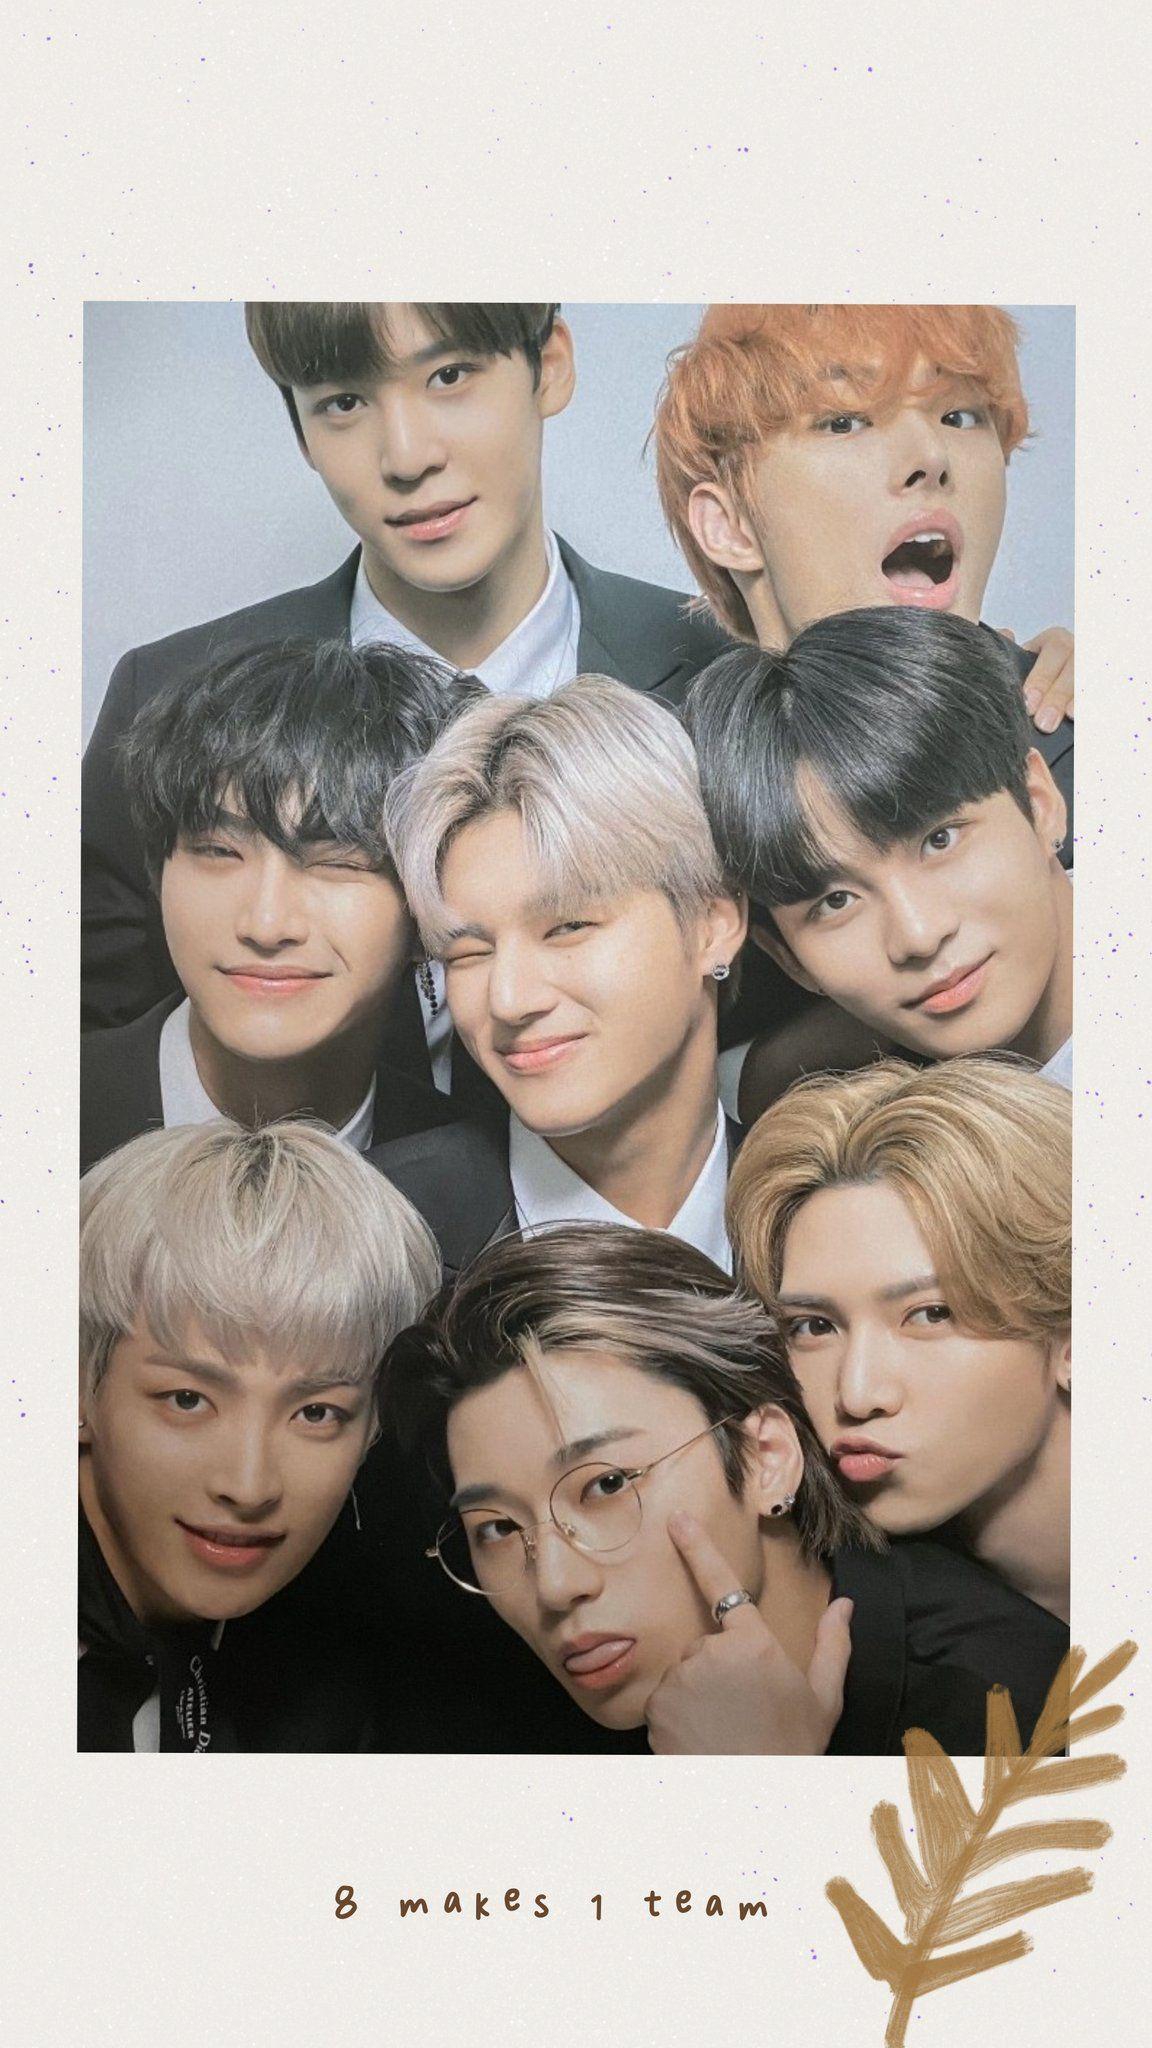 Pin By Lia On Kpop Idols Movie Posters Kpop Idol Poster